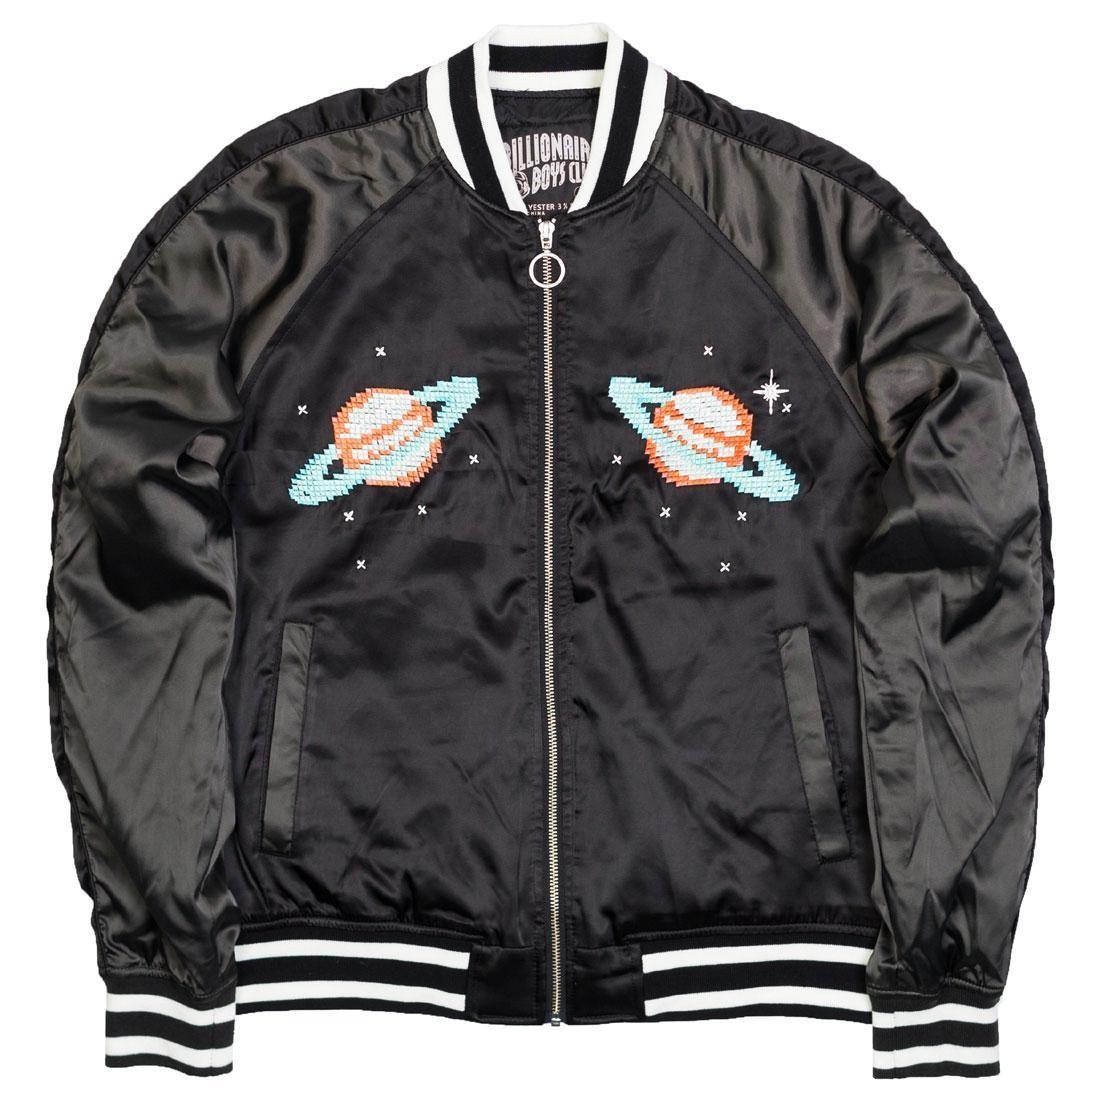 306a088d0 Billionaire Boys Club Men Flare Jacket black